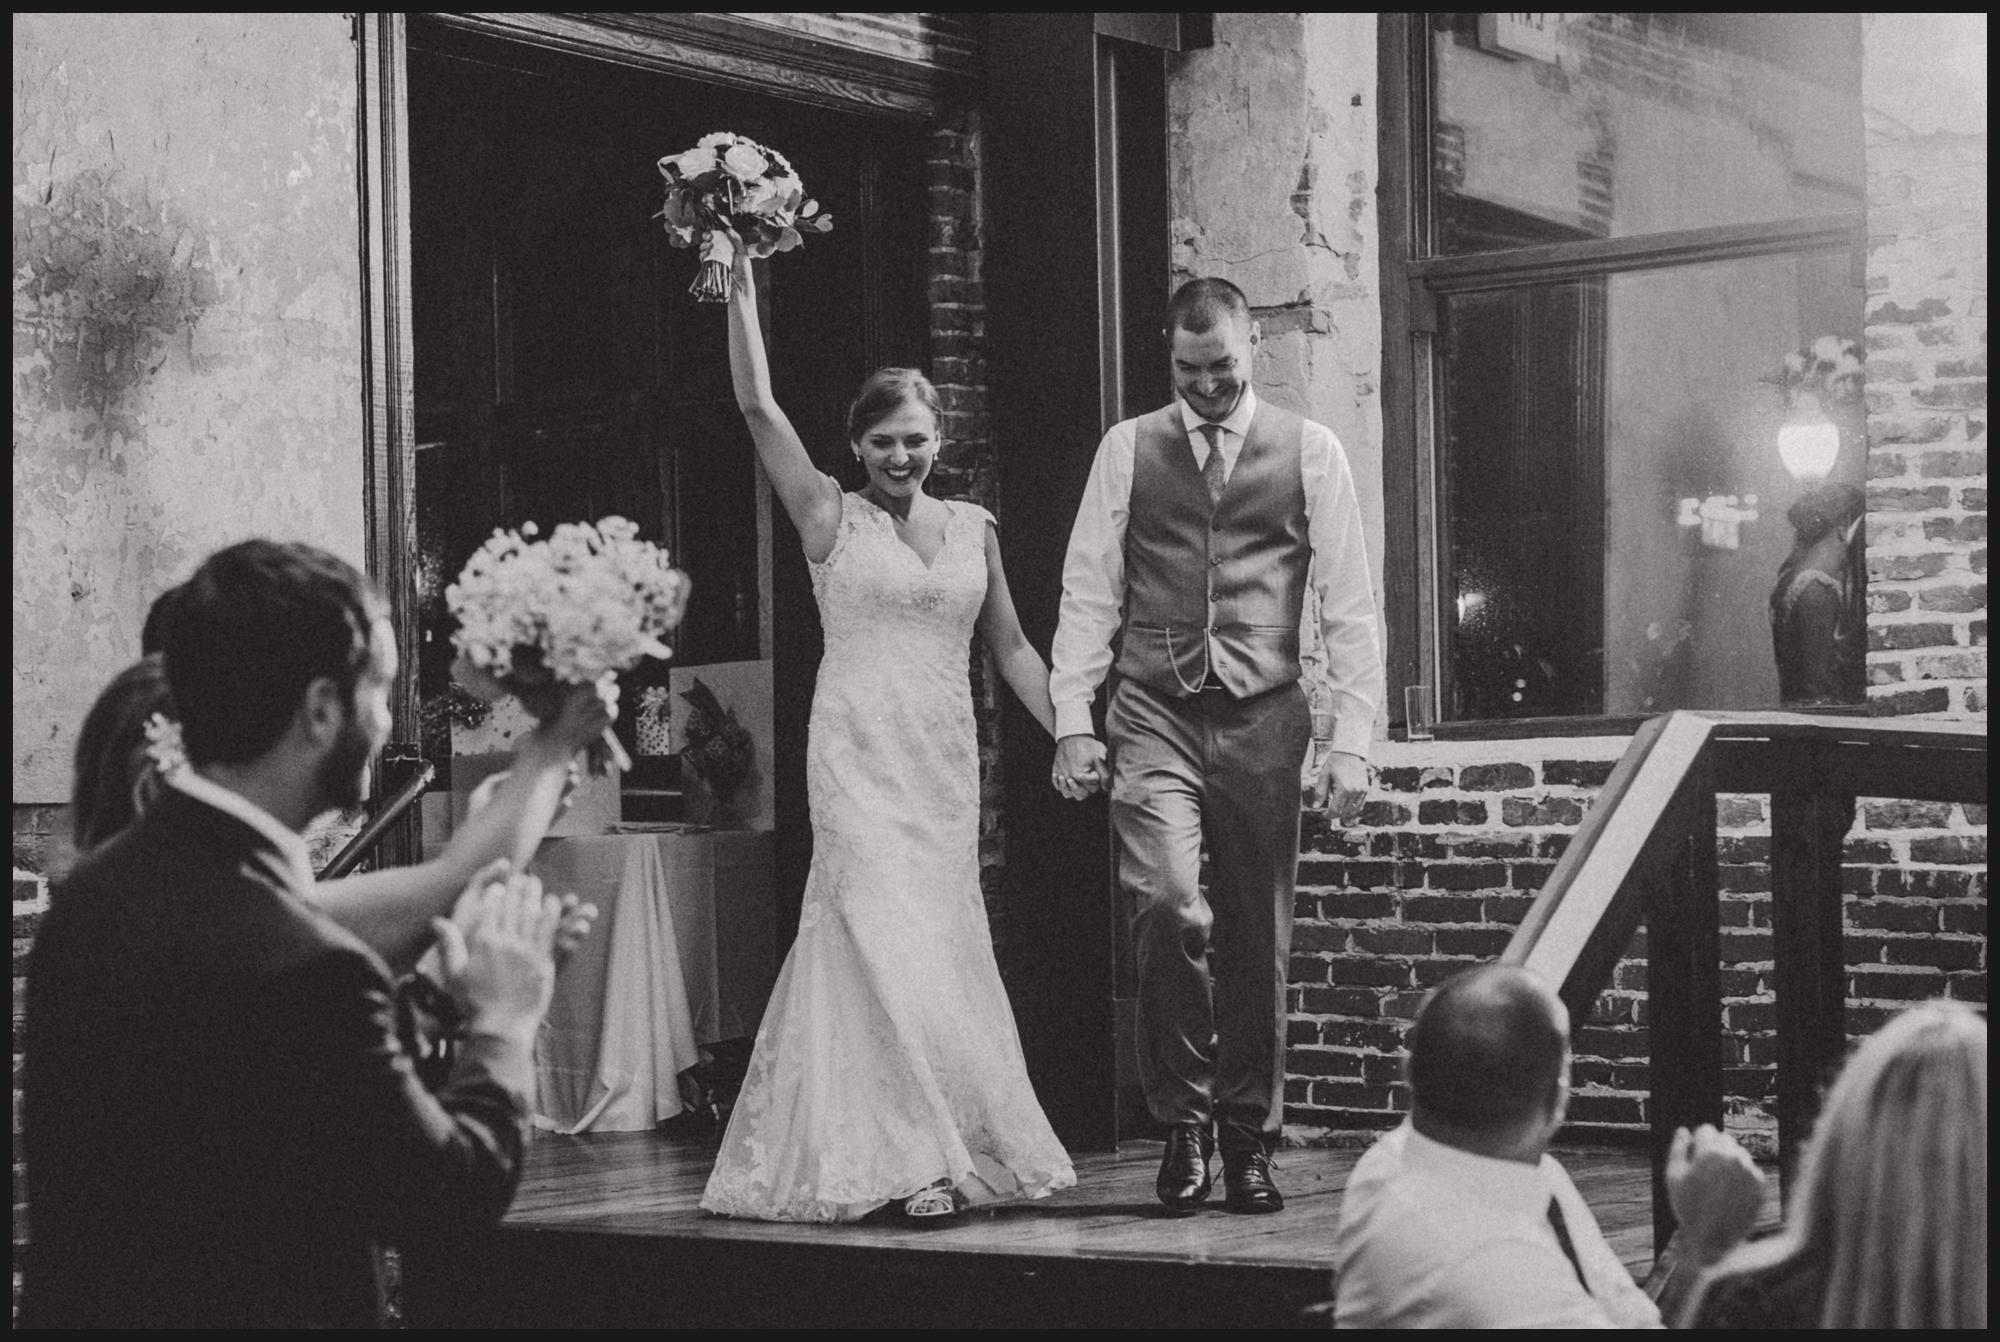 Orlando-Wedding-Photographer-destination-wedding-photographer-florida-wedding-photographer-bohemian-wedding-photographer_0649.jpg